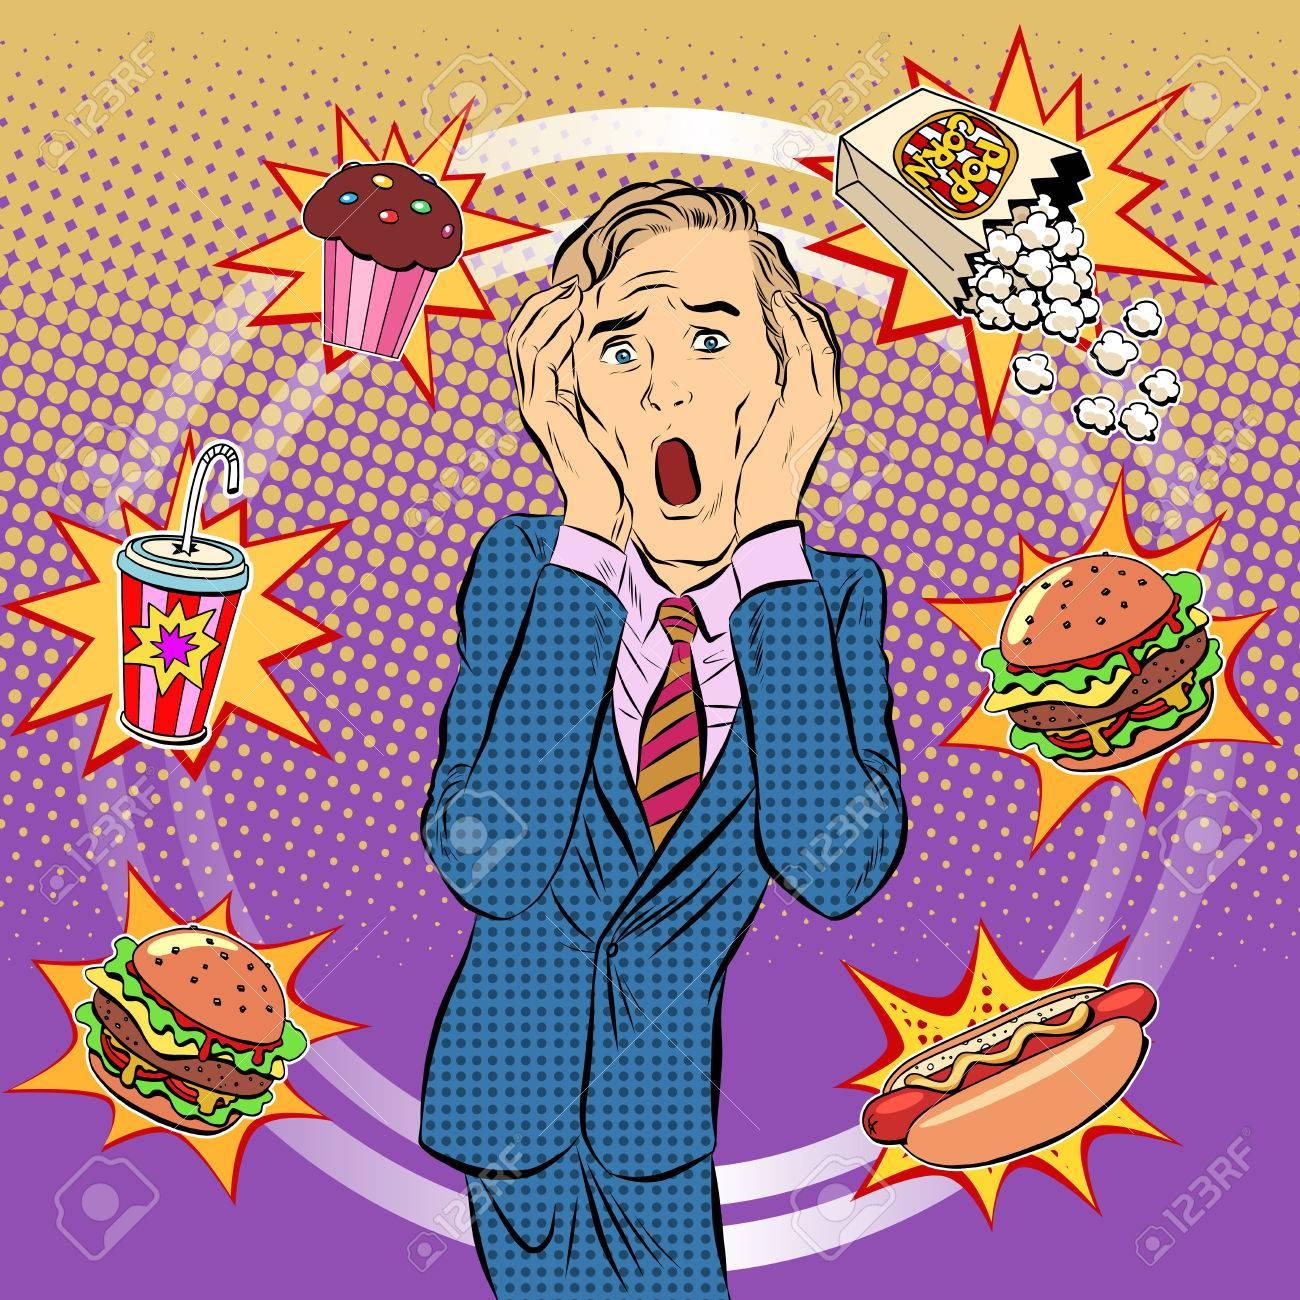 fast food uomo malsano dieta panico pop art stile retrò. lo stato ... - Pranzo Ufficio Dieta